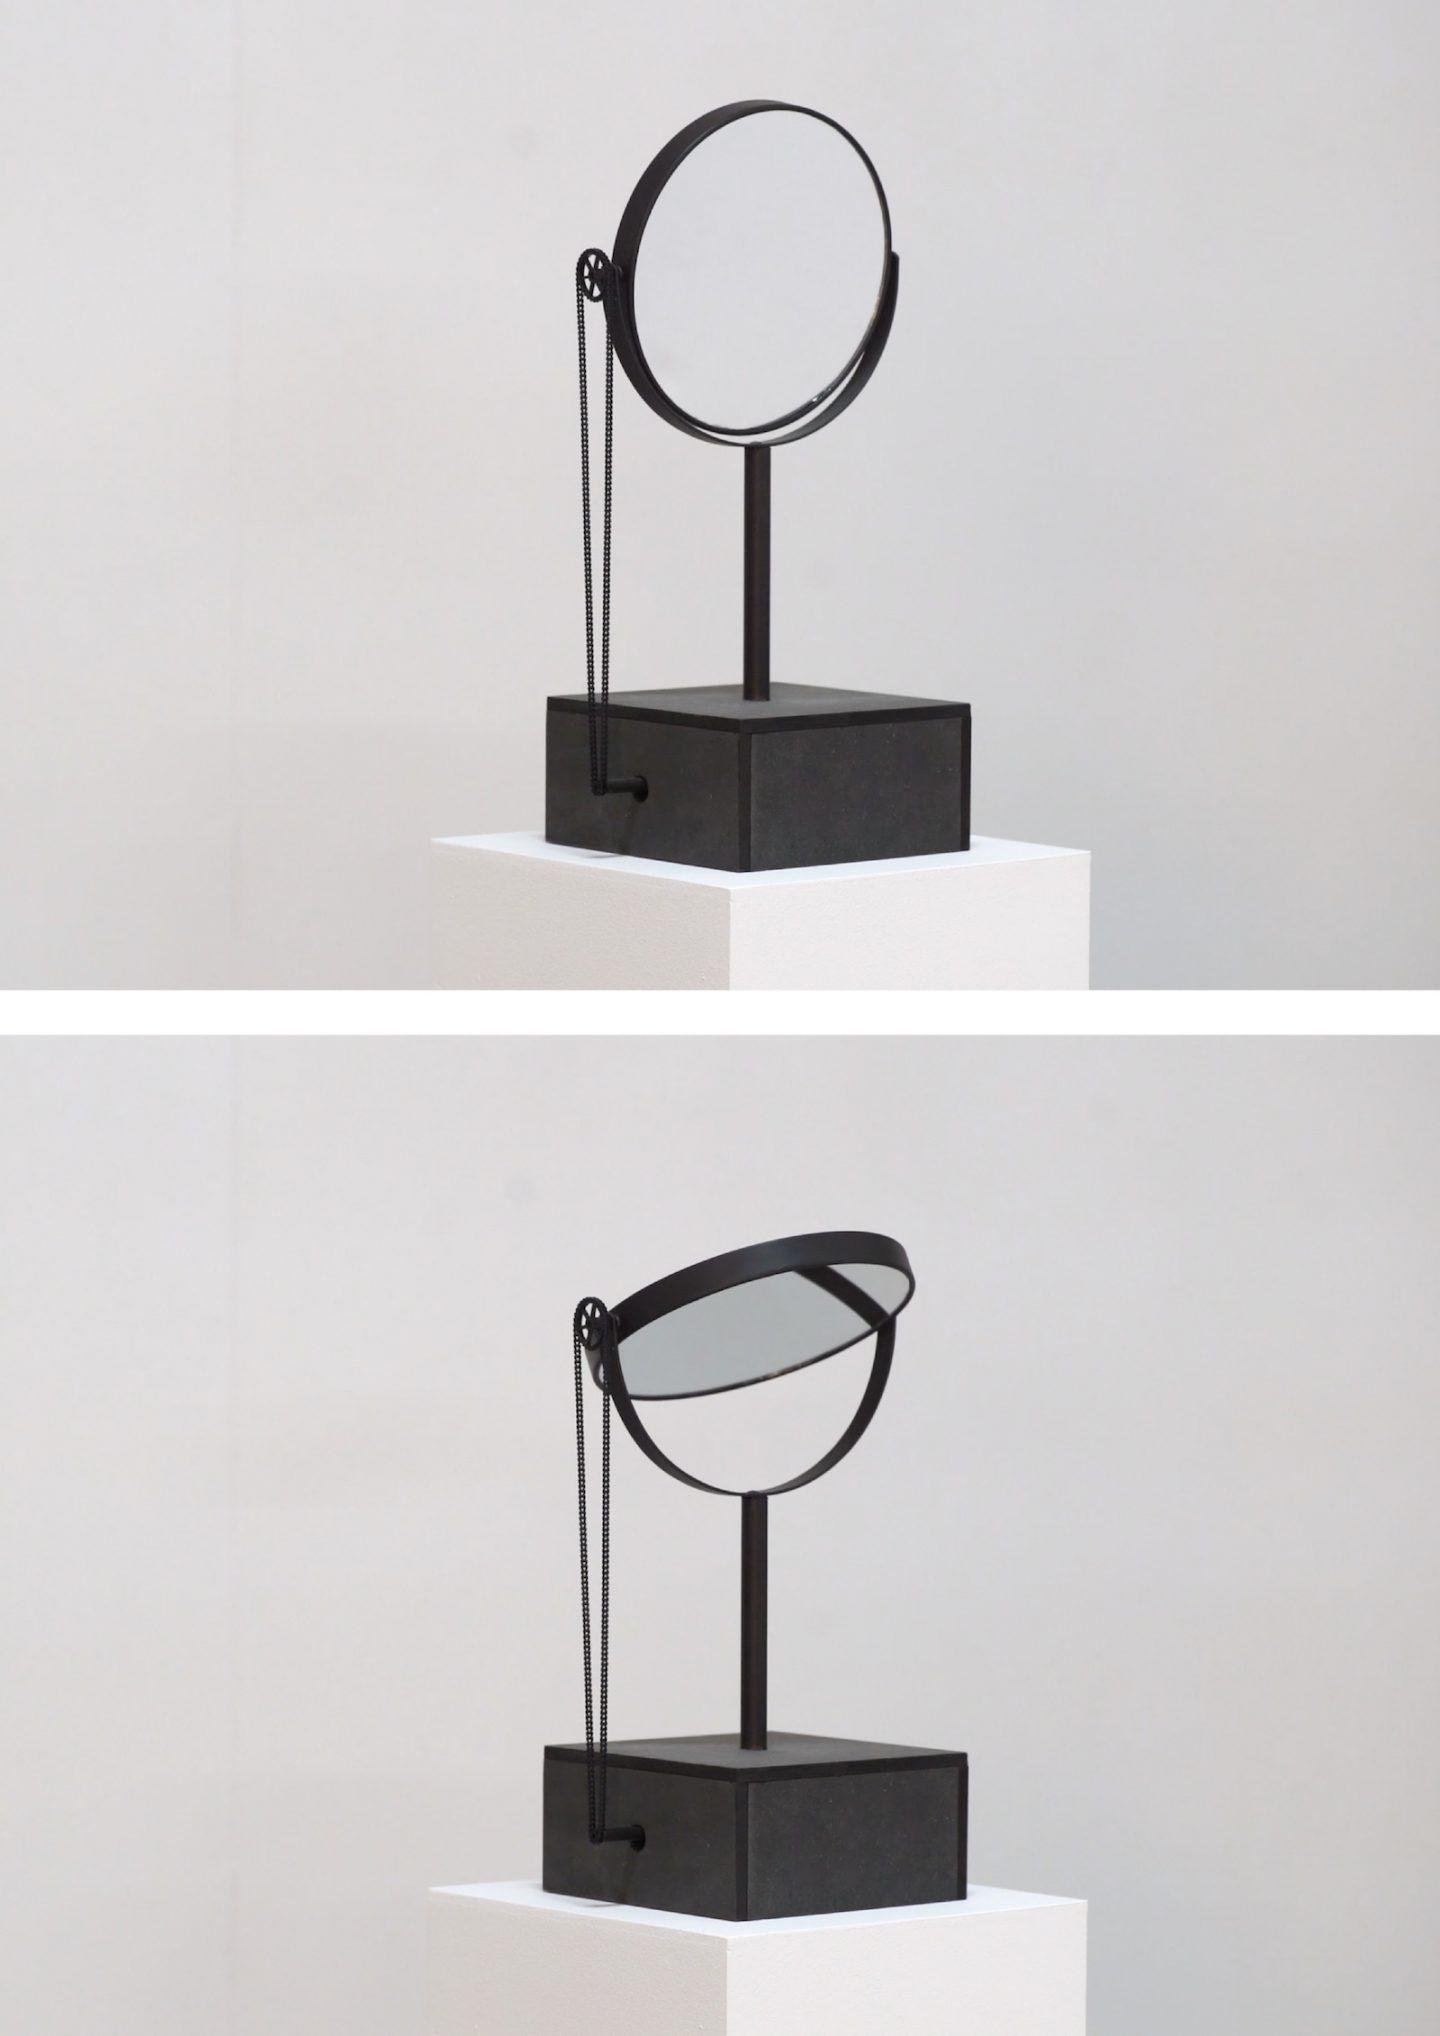 IGNANT-Art-Valentin-Abad-005